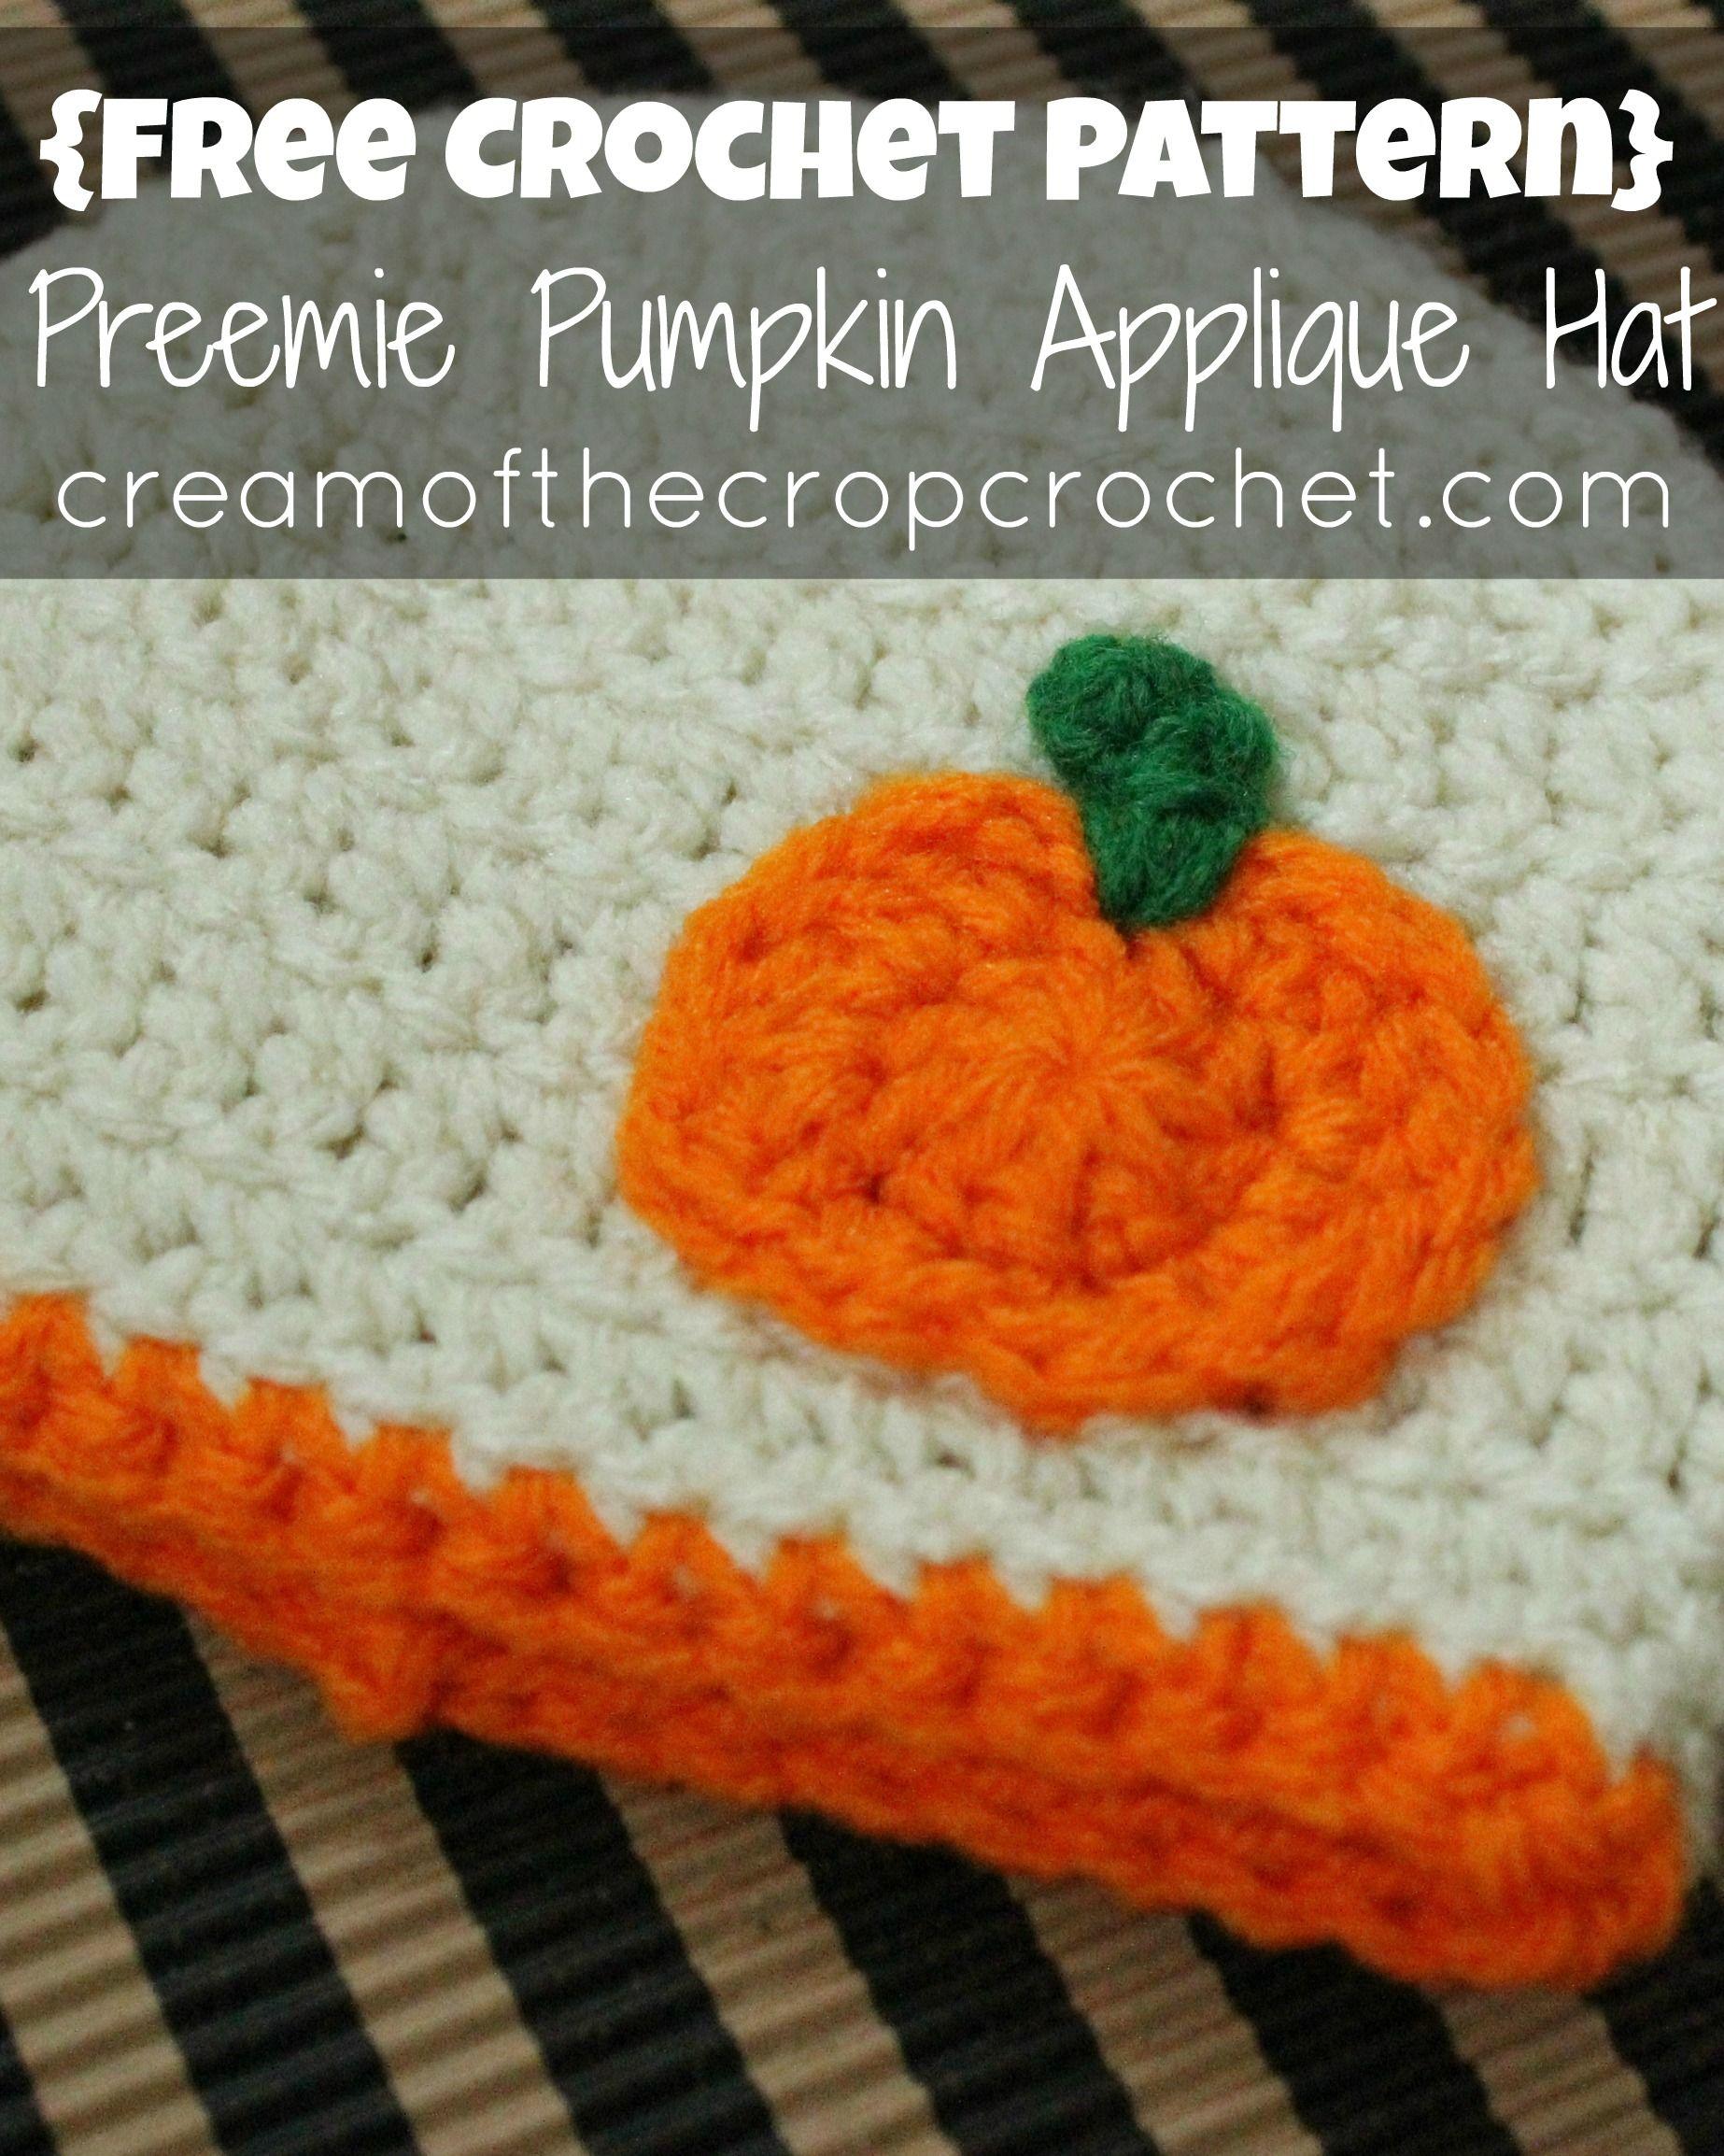 Preemie/Newborn Pumpkin Applique Hats - Craftfoxes